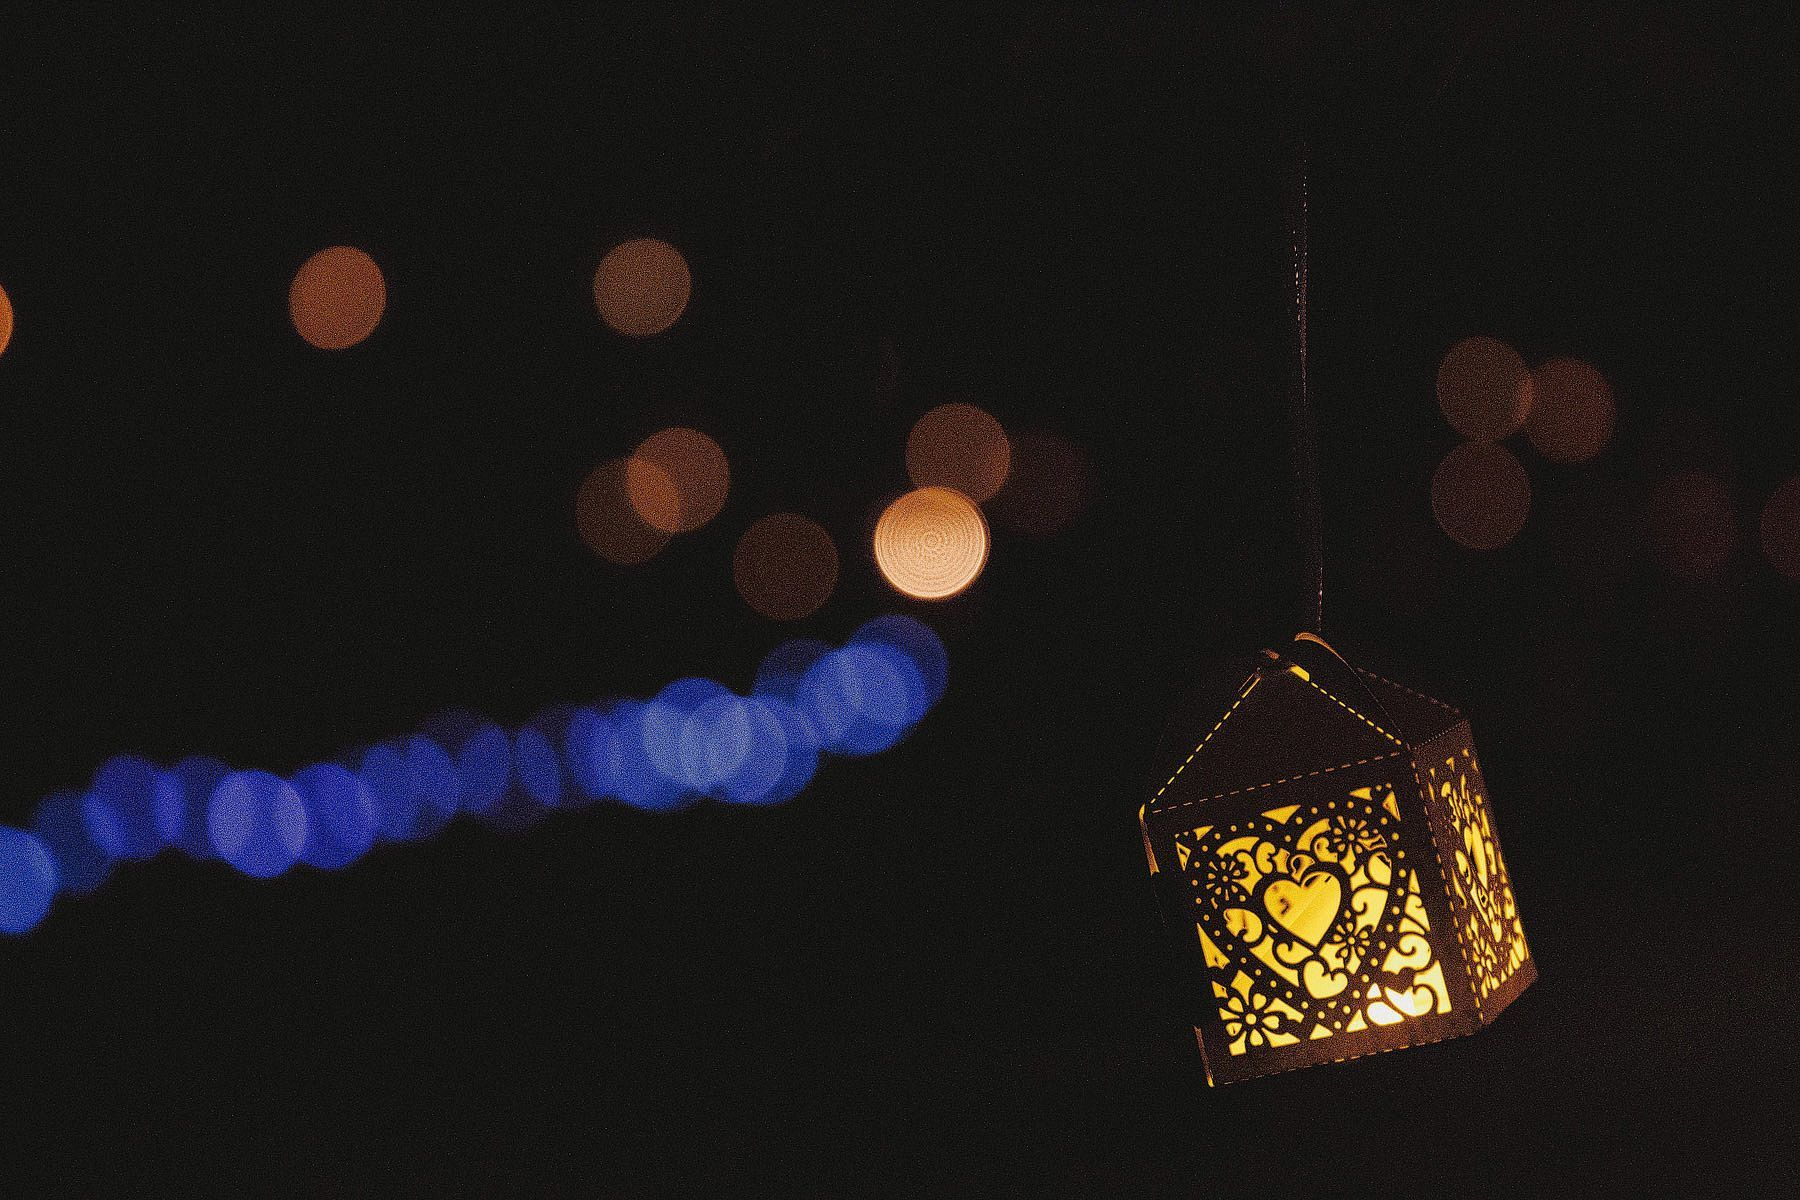 evening lanterns at a wedding